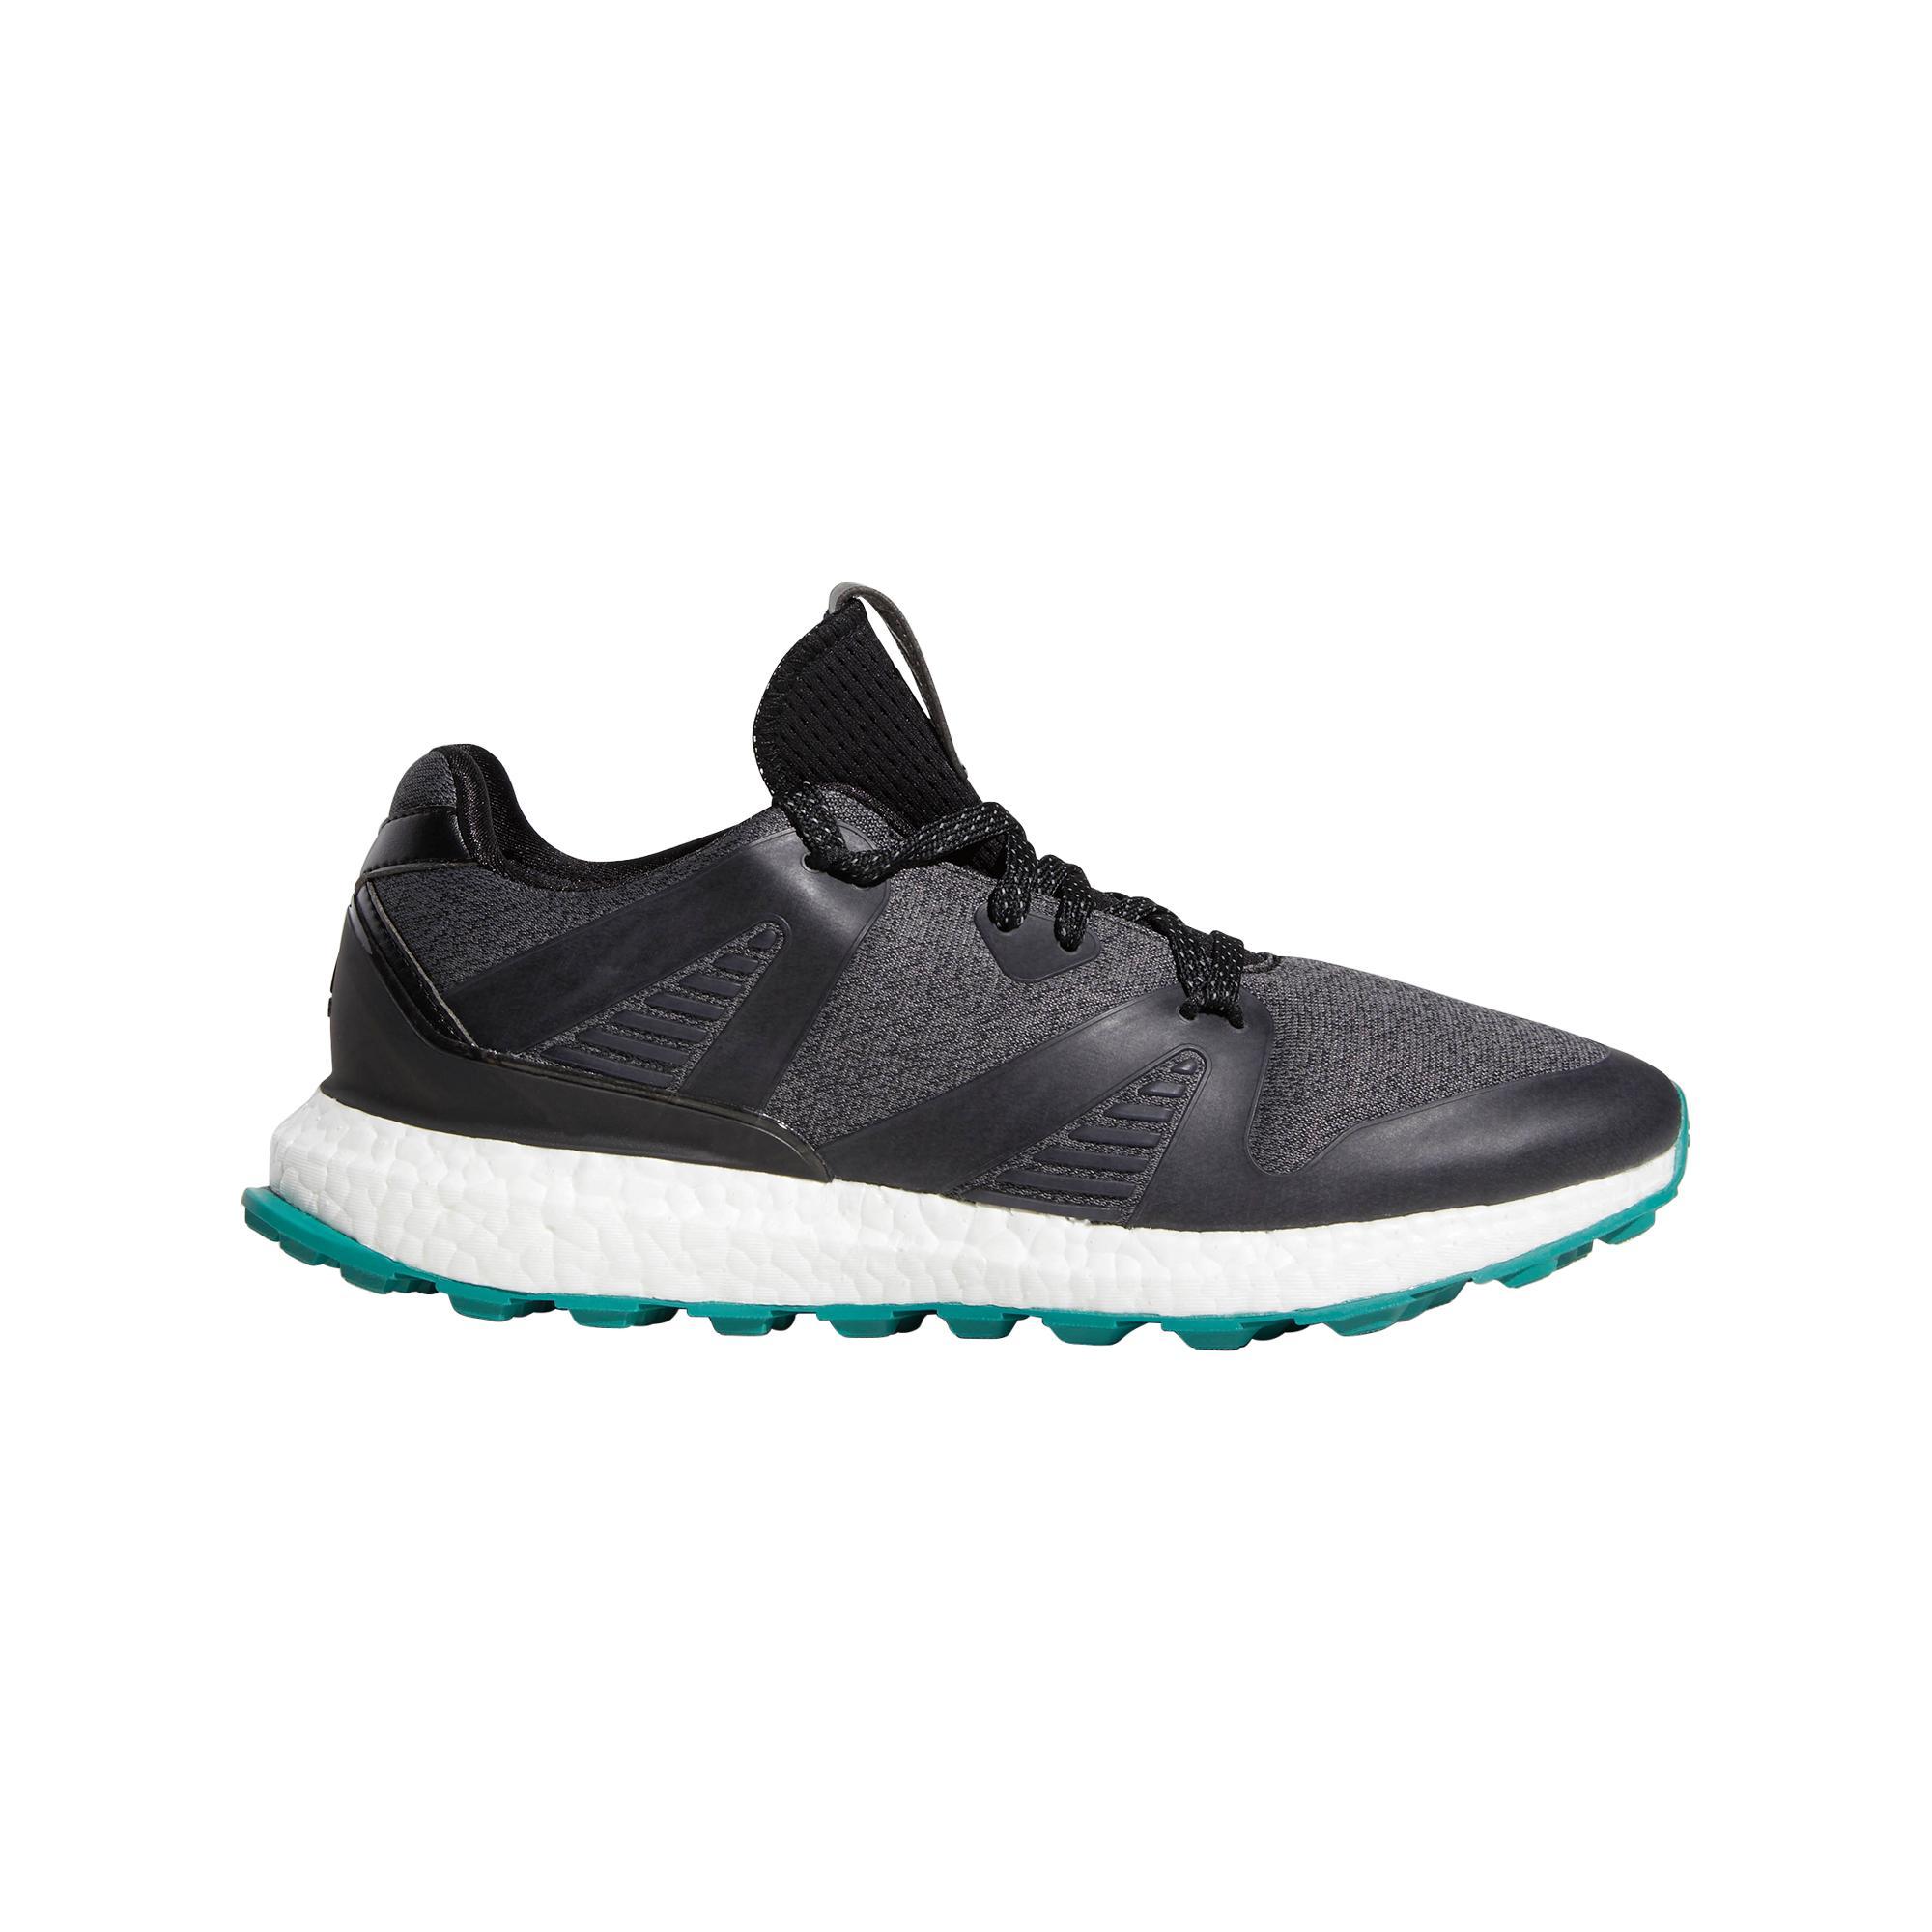 Men's Crossknit 3.0 Spikeless Golf Shoe - Black/Turquoise